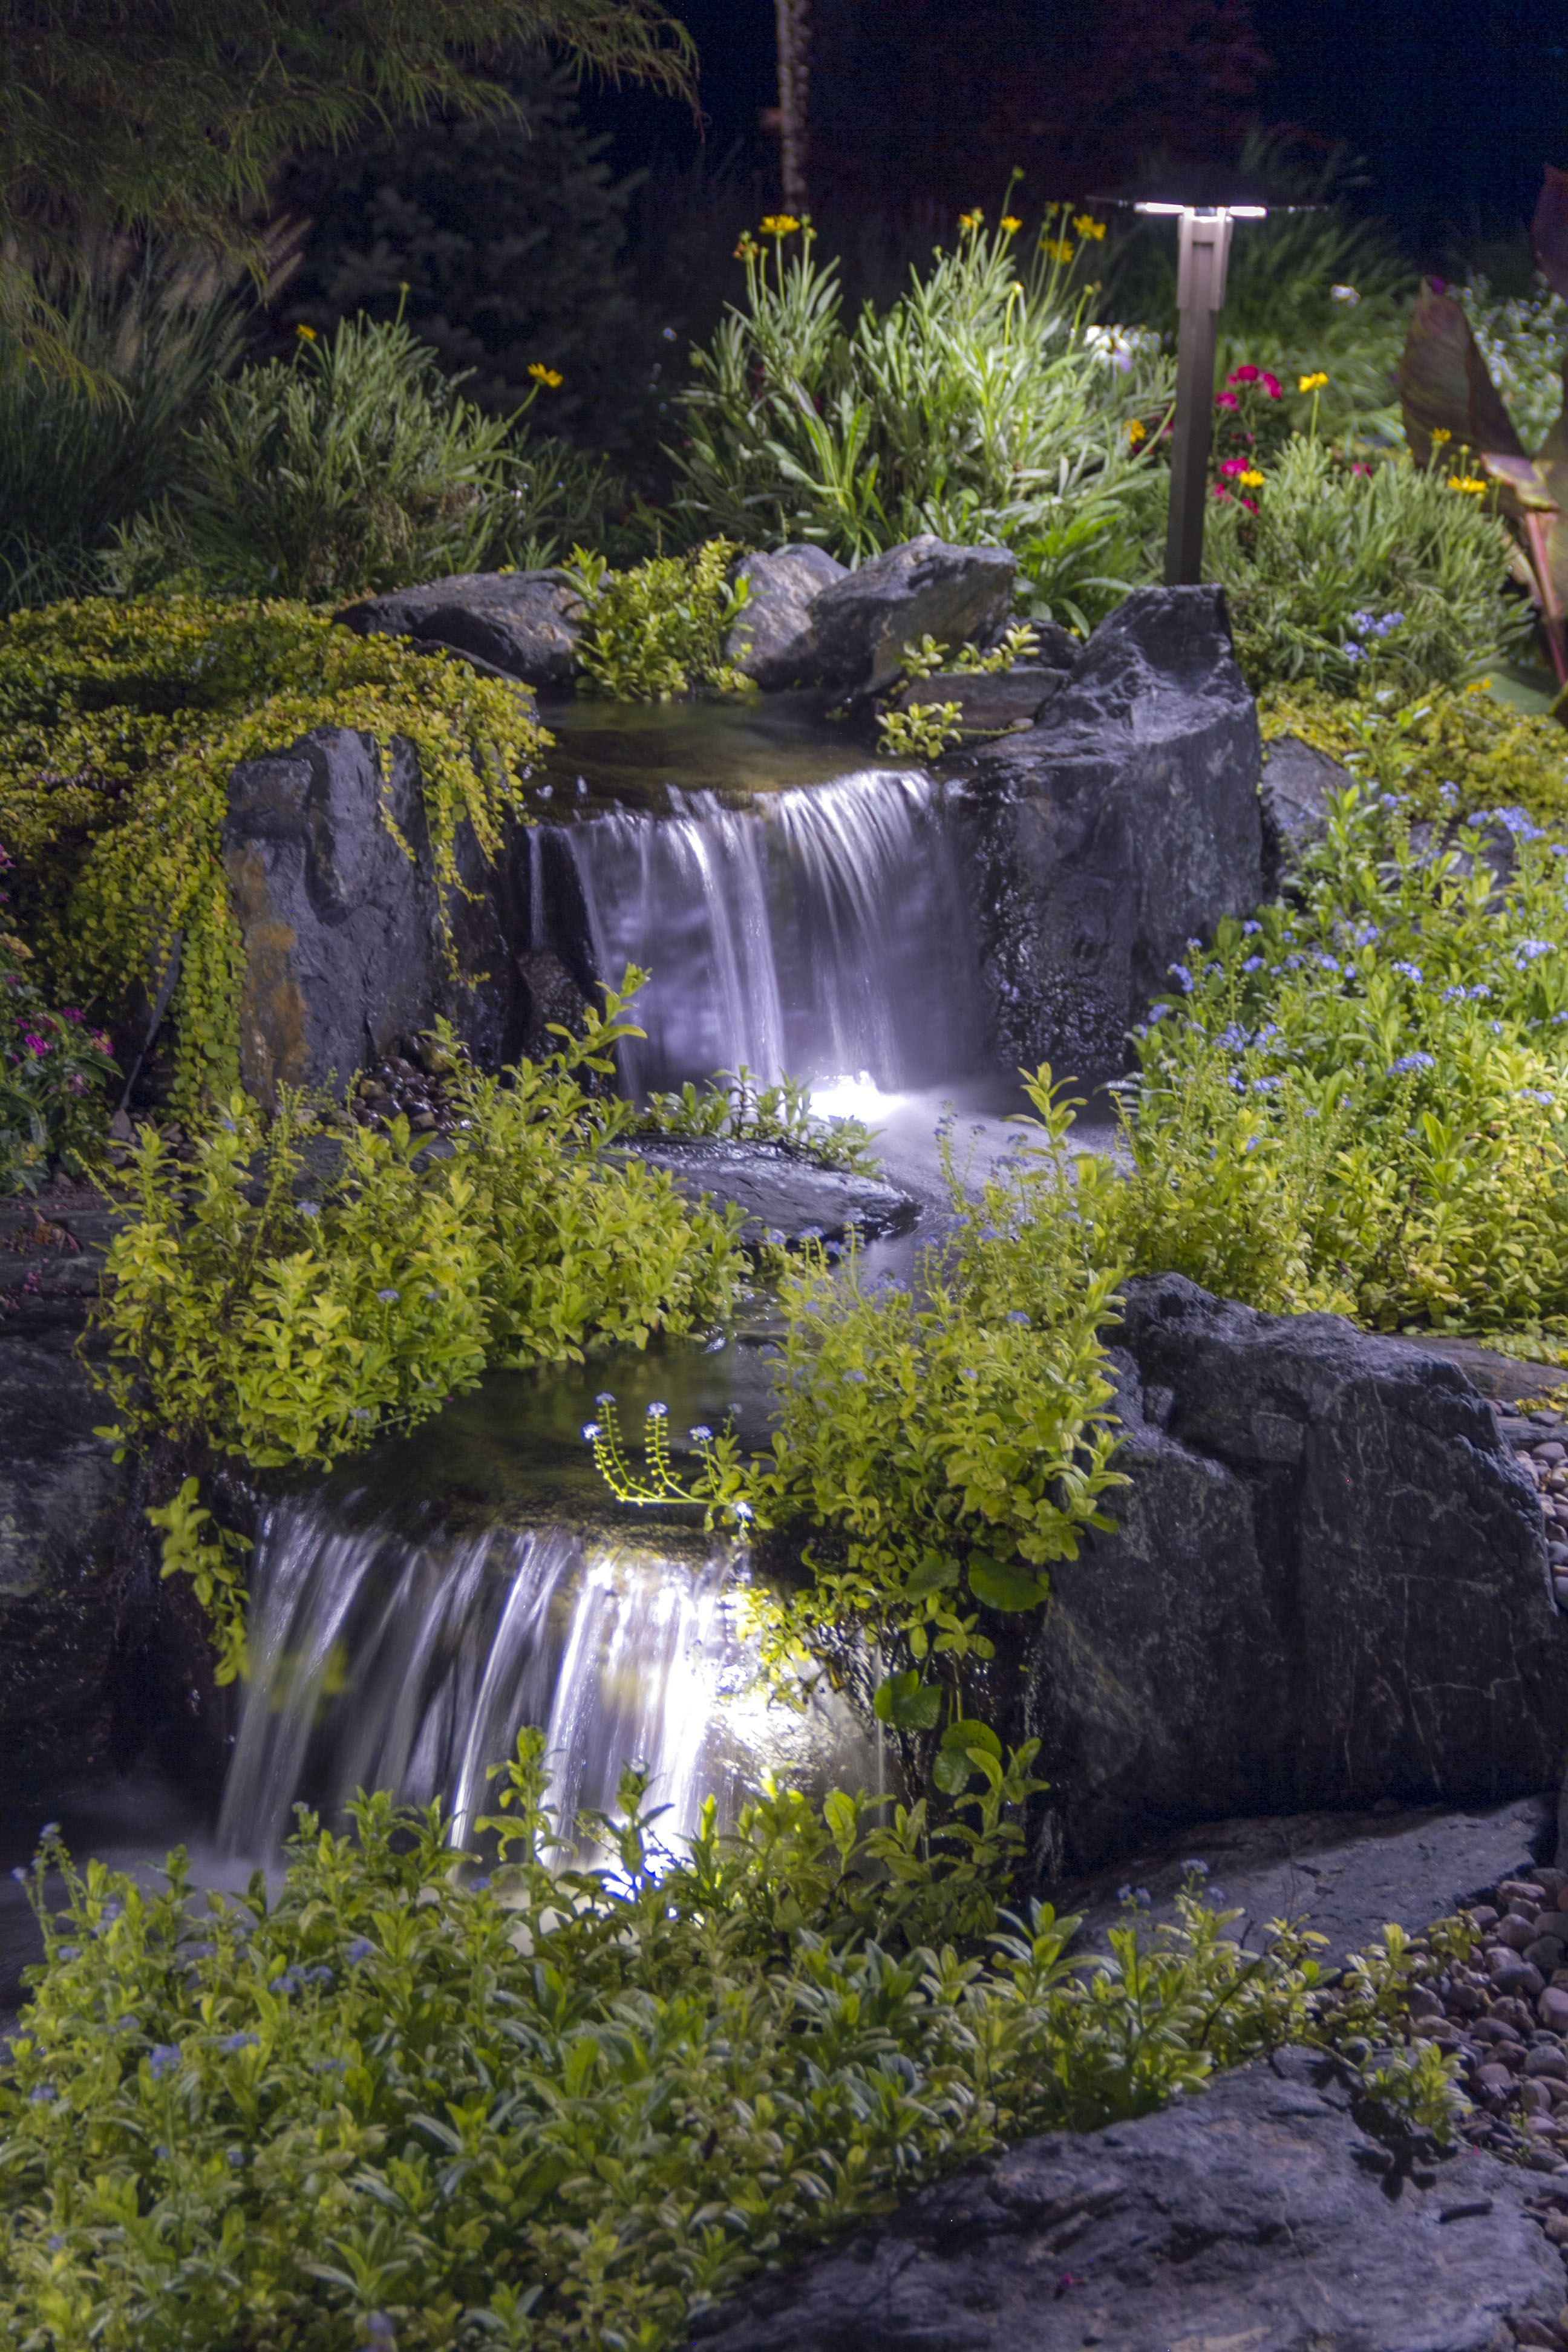 Waterfall Lighting | Waterfalls backyard, Ponds backyard ... on Small Backyard Pond With Waterfall id=49164